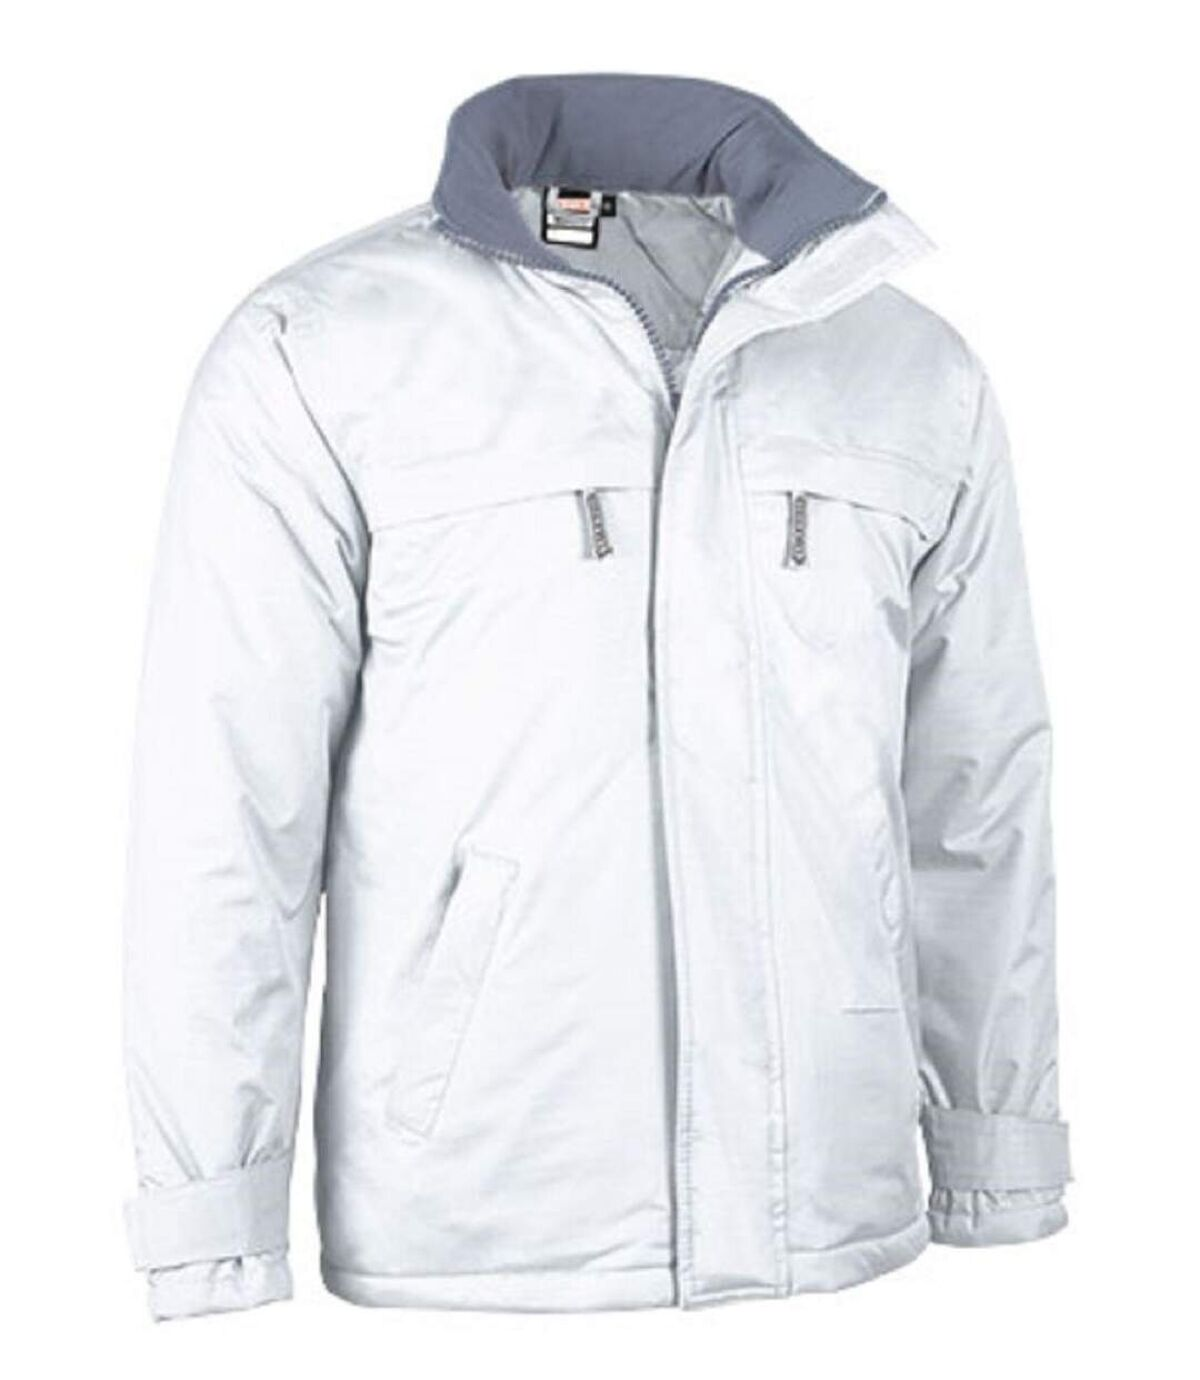 Parka - Homme - REF BOREAL - blanc